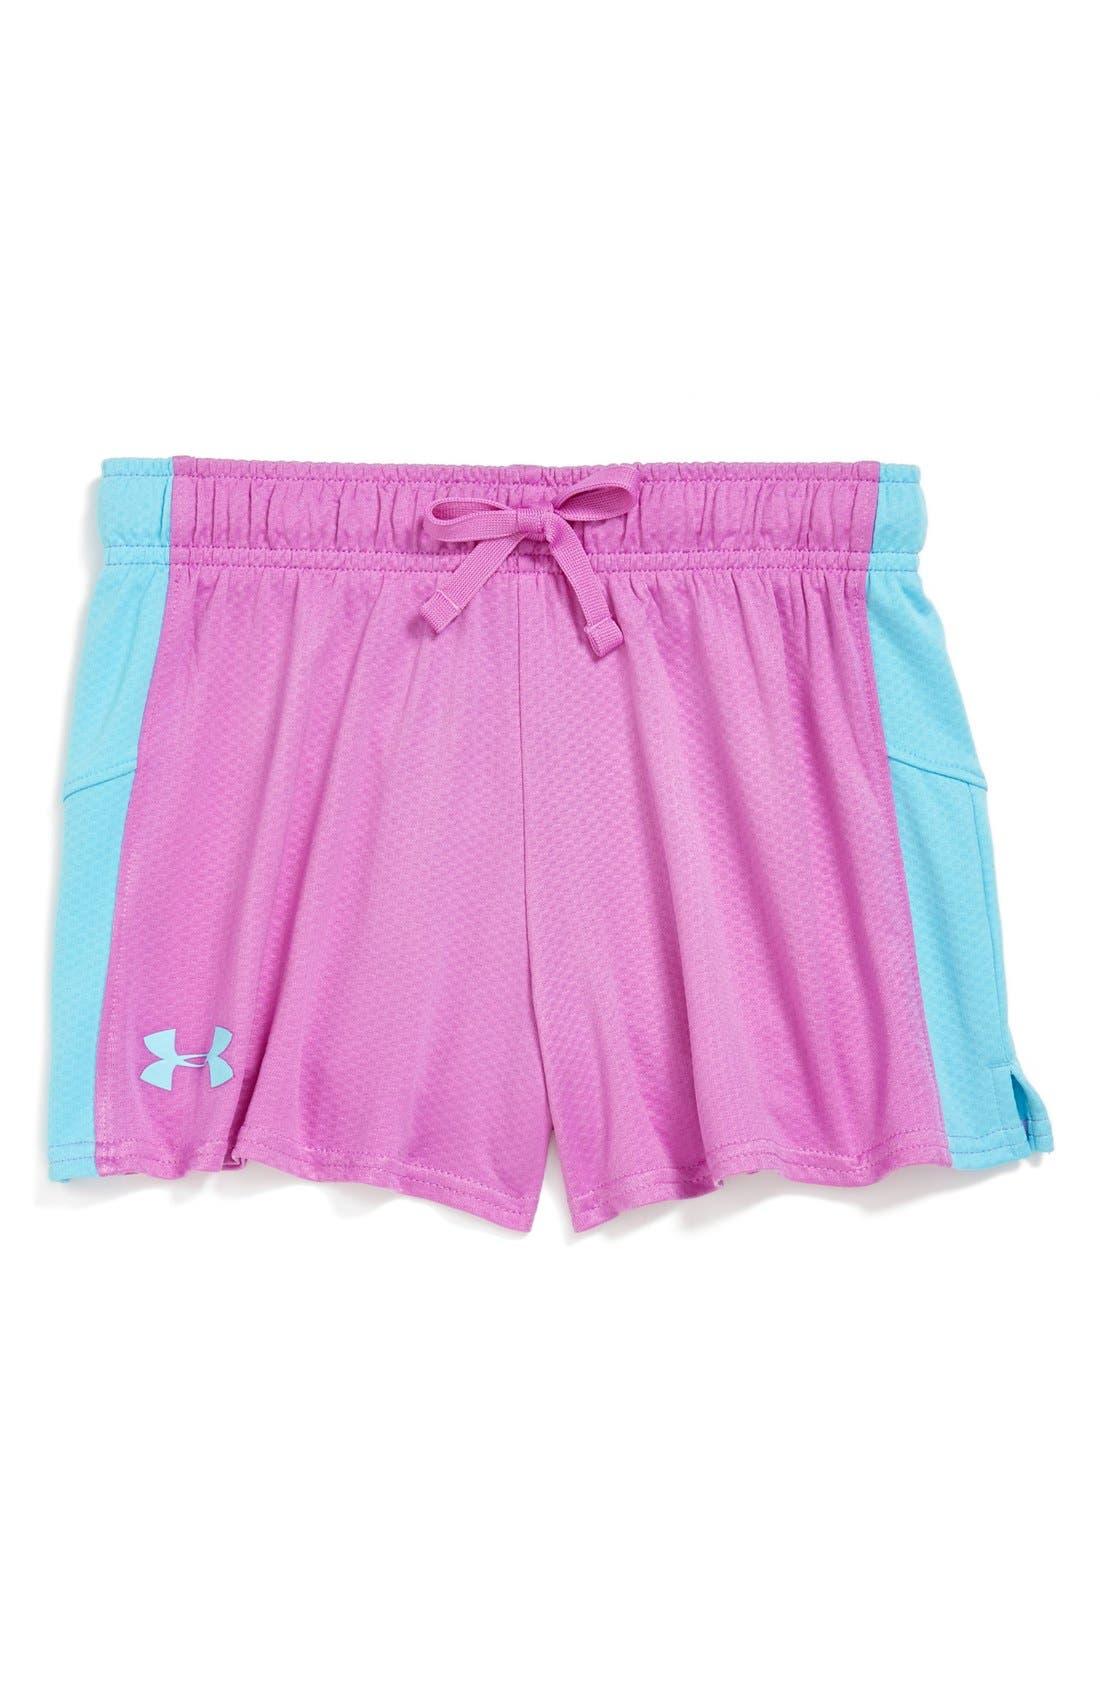 Main Image - Under Armour 'Intensity' HeatGear® Shorts (Big Girls)